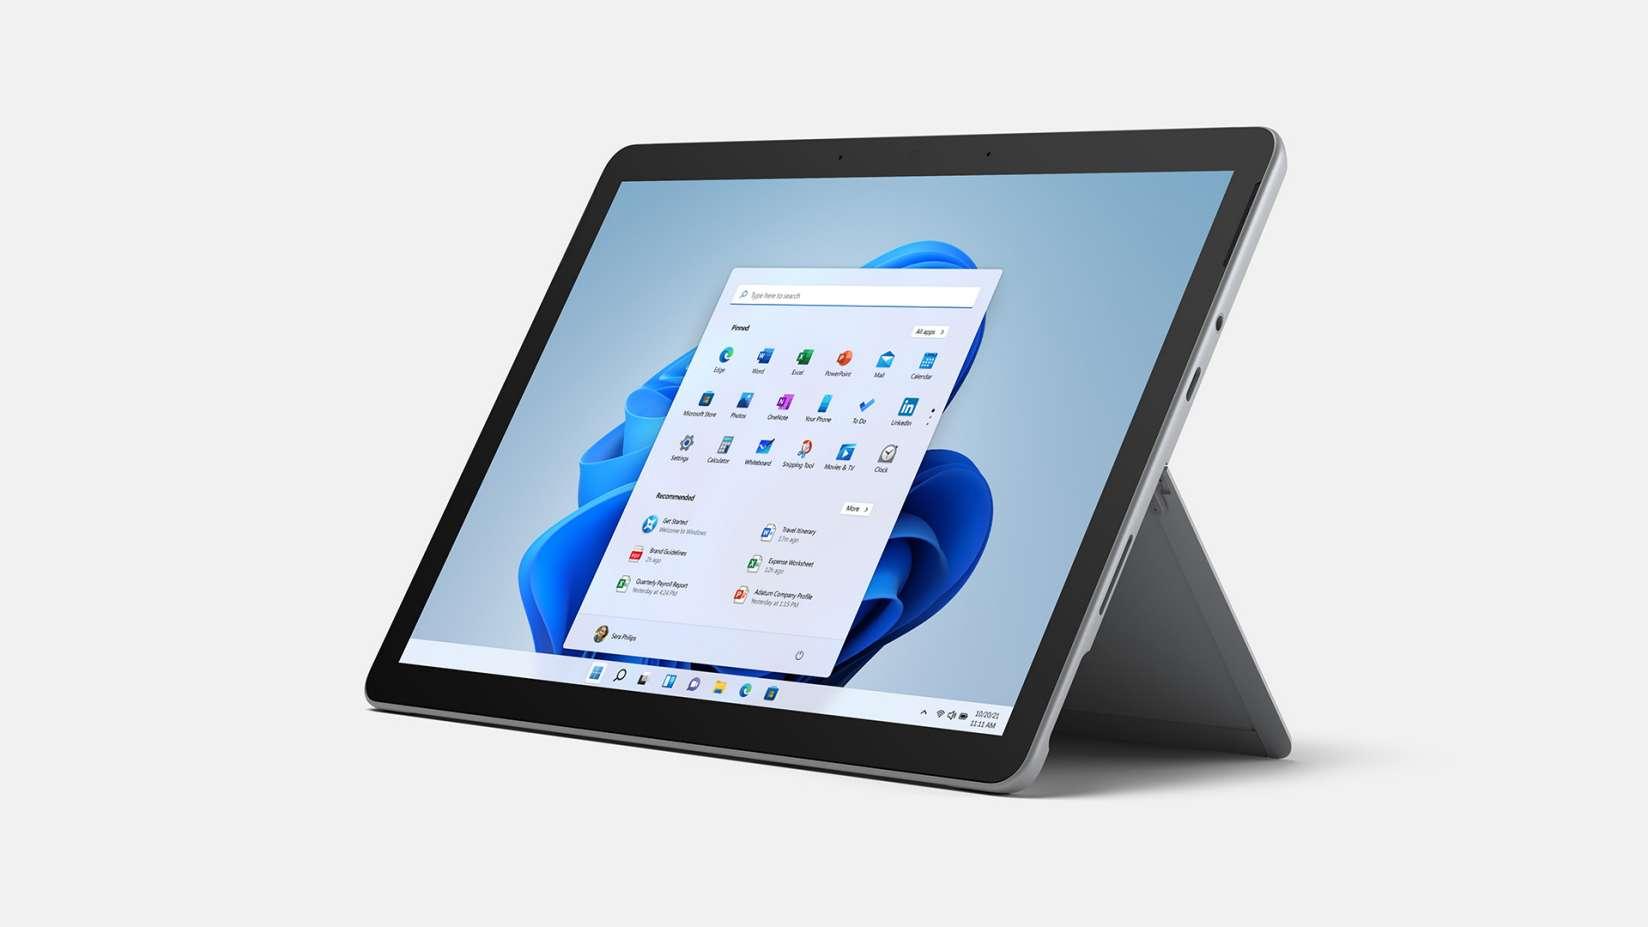 Surface Go 3為最輕巧可攜的Surface PC,透過第10代Intel Core i3處理器提供二合一的多樣使用情境.jpg